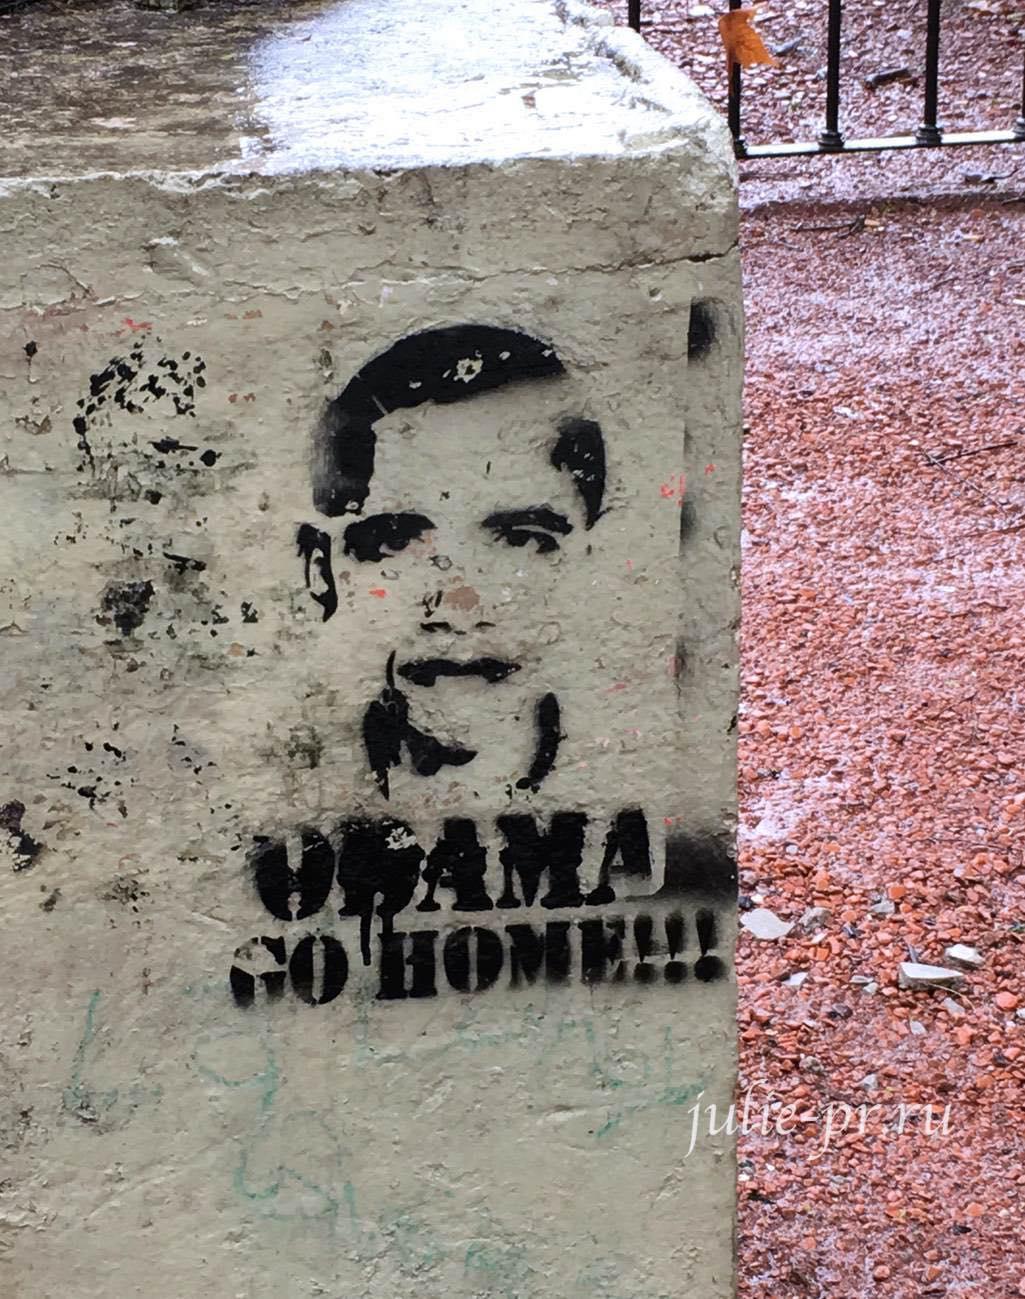 Аргентина, Буэнос-Айрес, Граффити, Обама